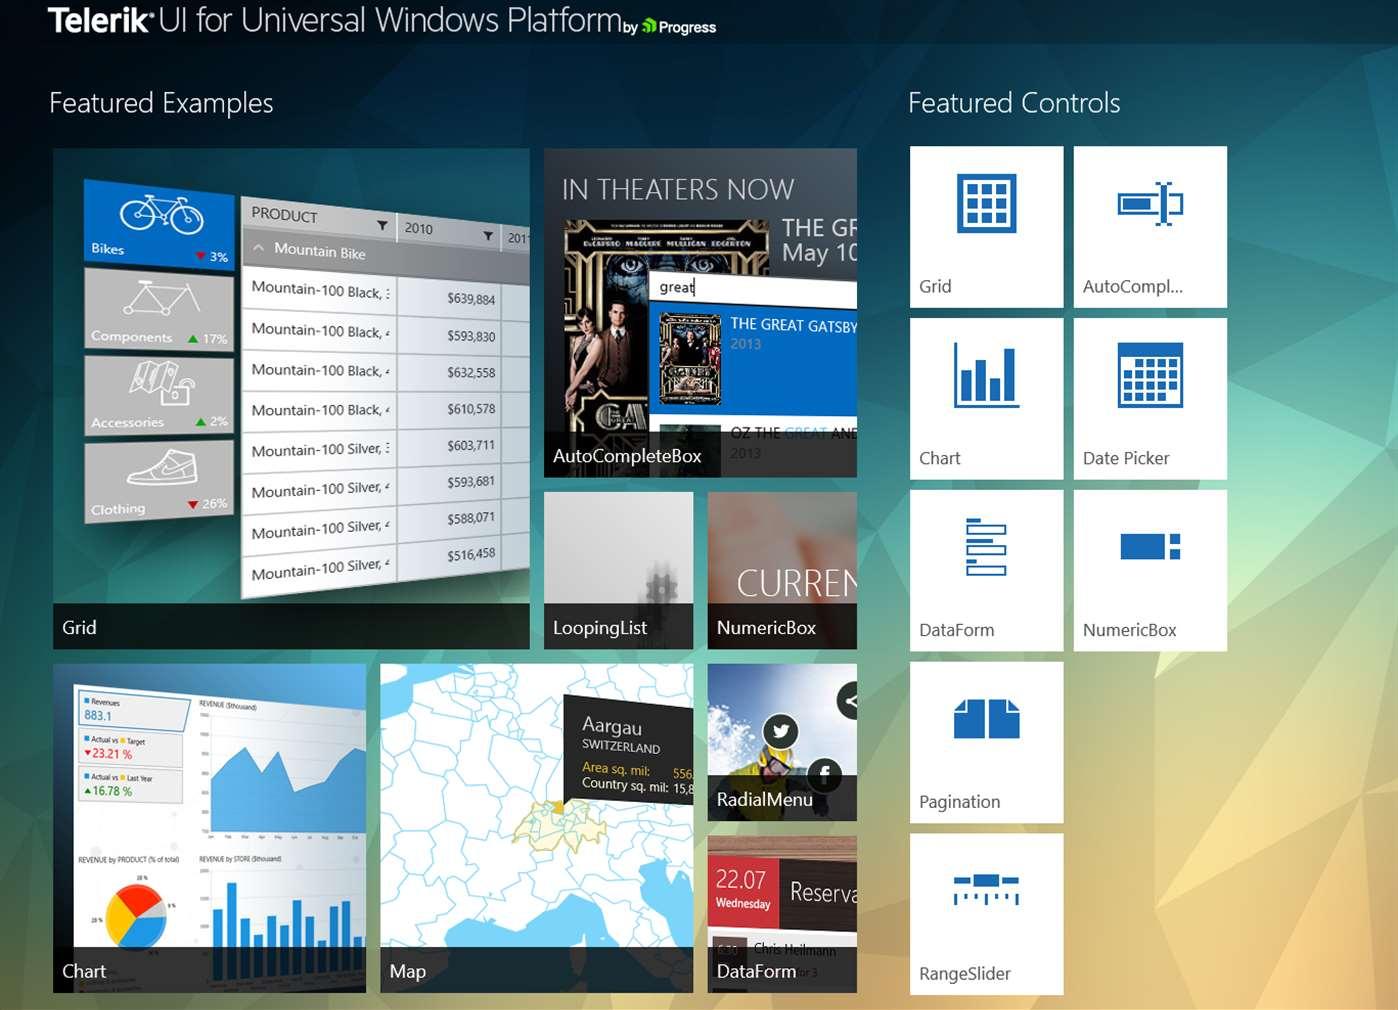 UI-For-UWP-Demos/README md at master · telerik/UI-For-UWP-Demos · GitHub